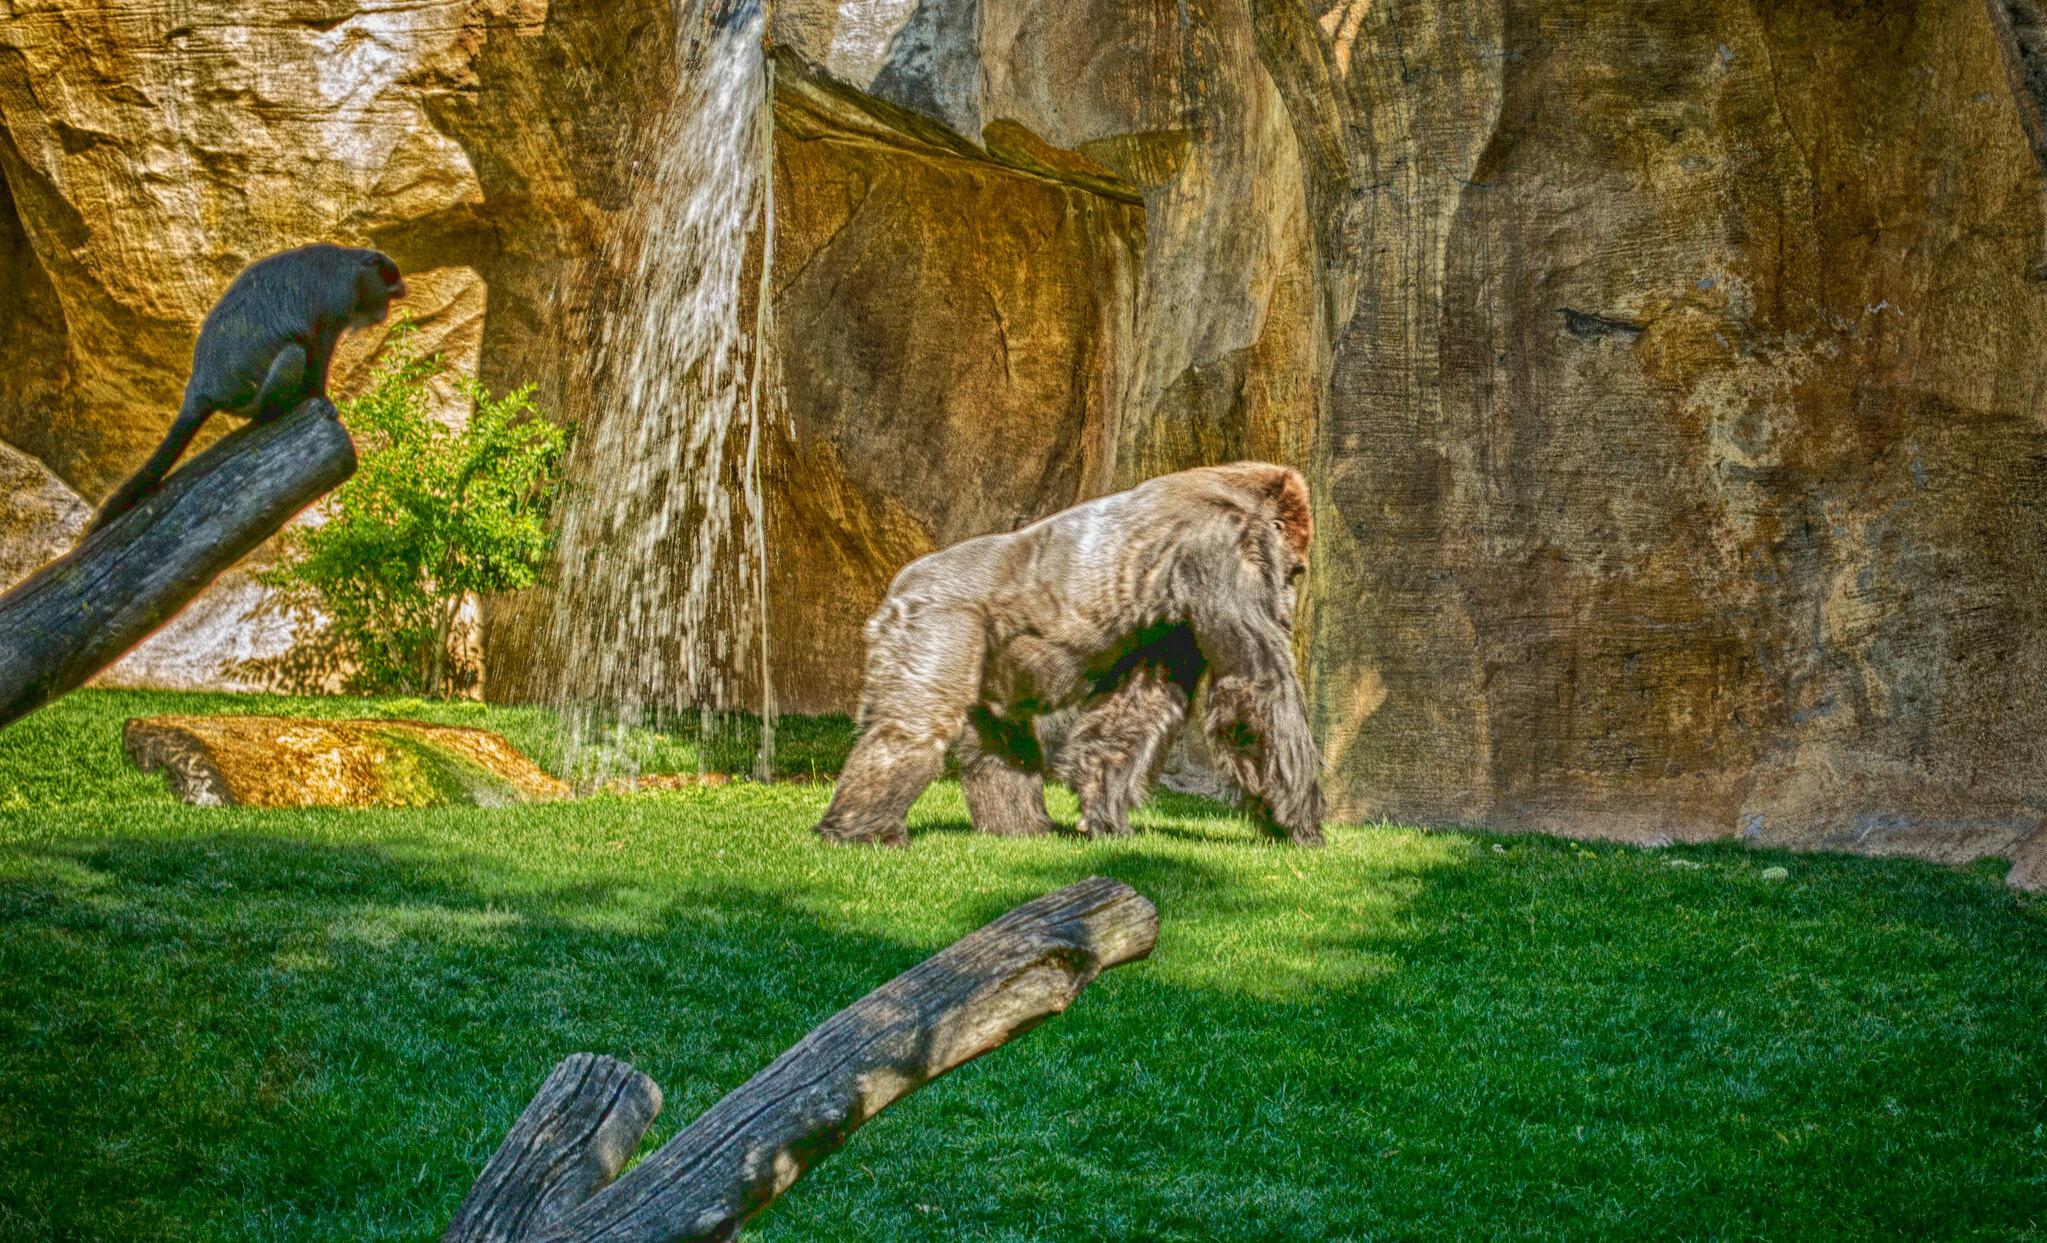 gorilla monkey biopark fuengirola.jpg